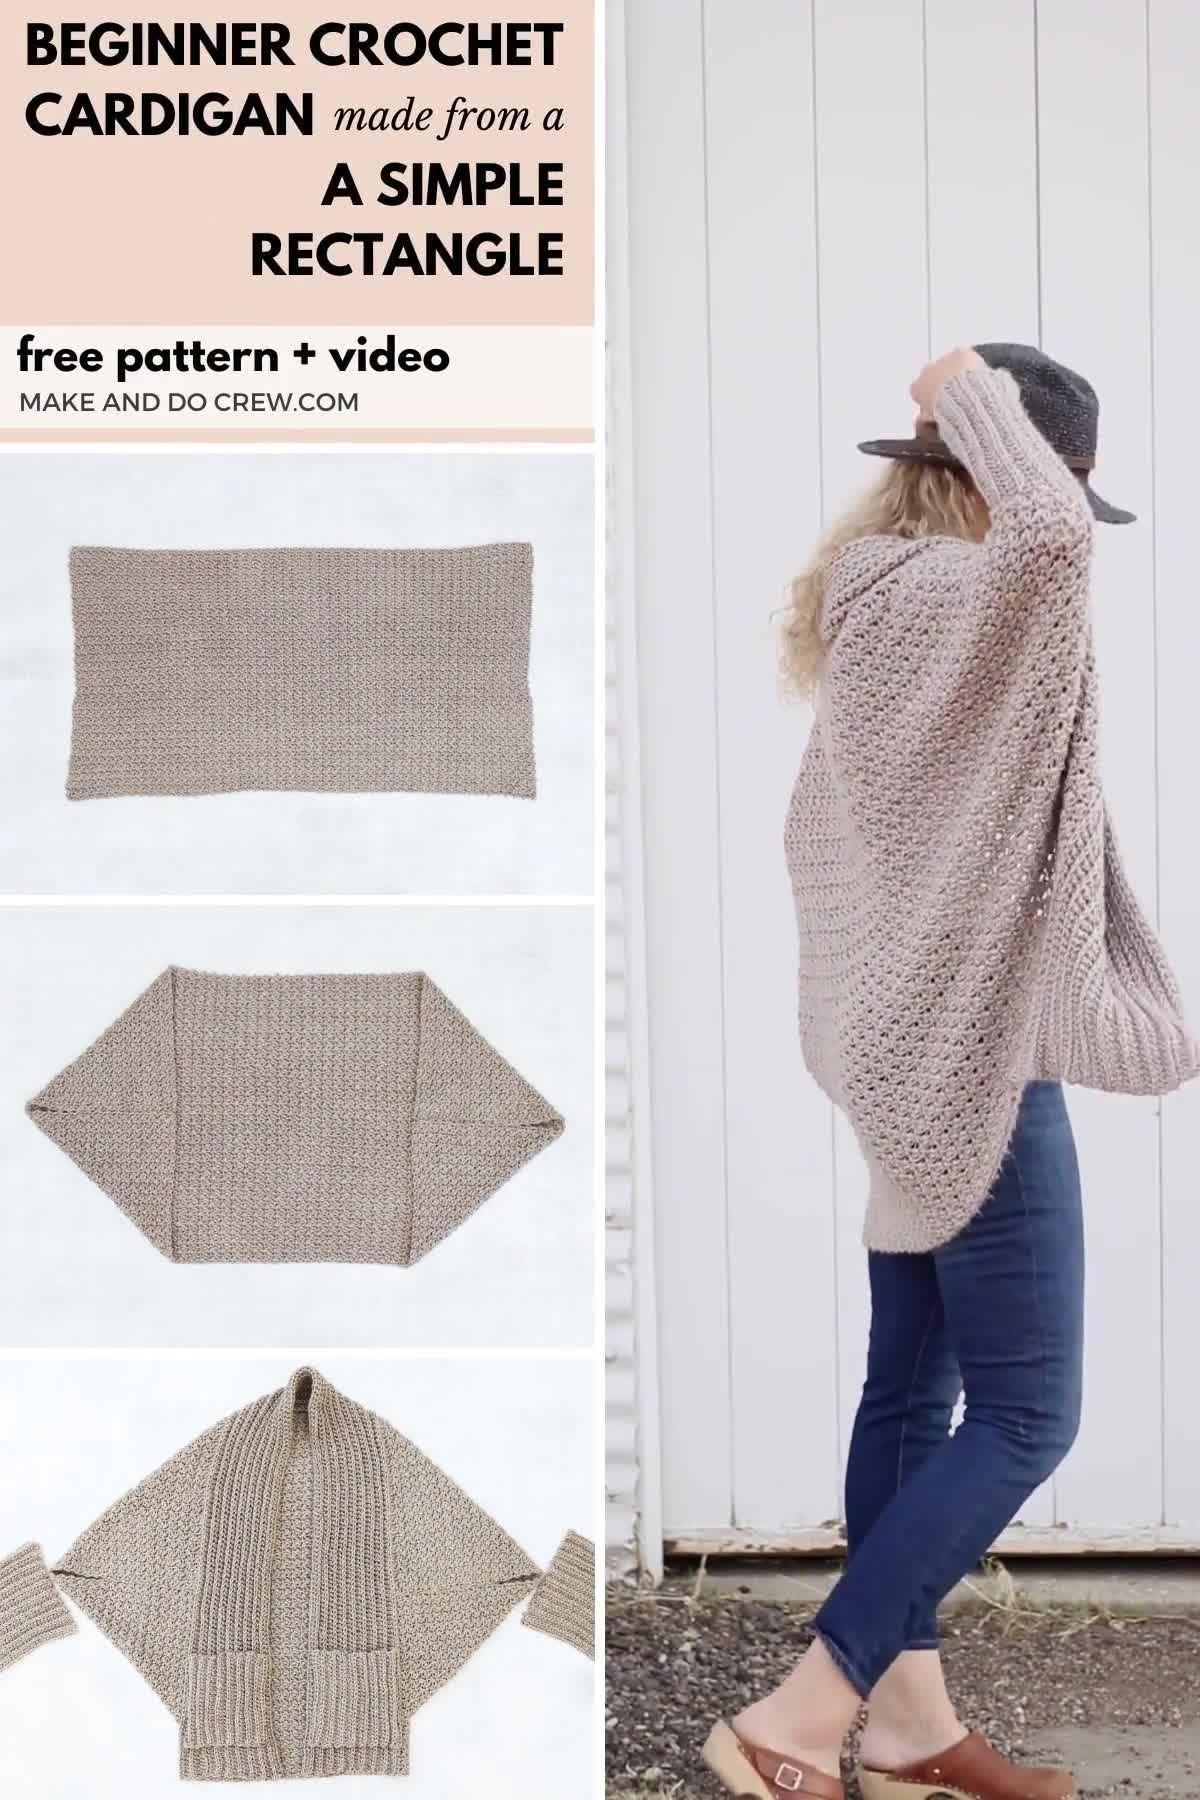 Free Beginner Crochet Sweater Pattern + Video Tutorial